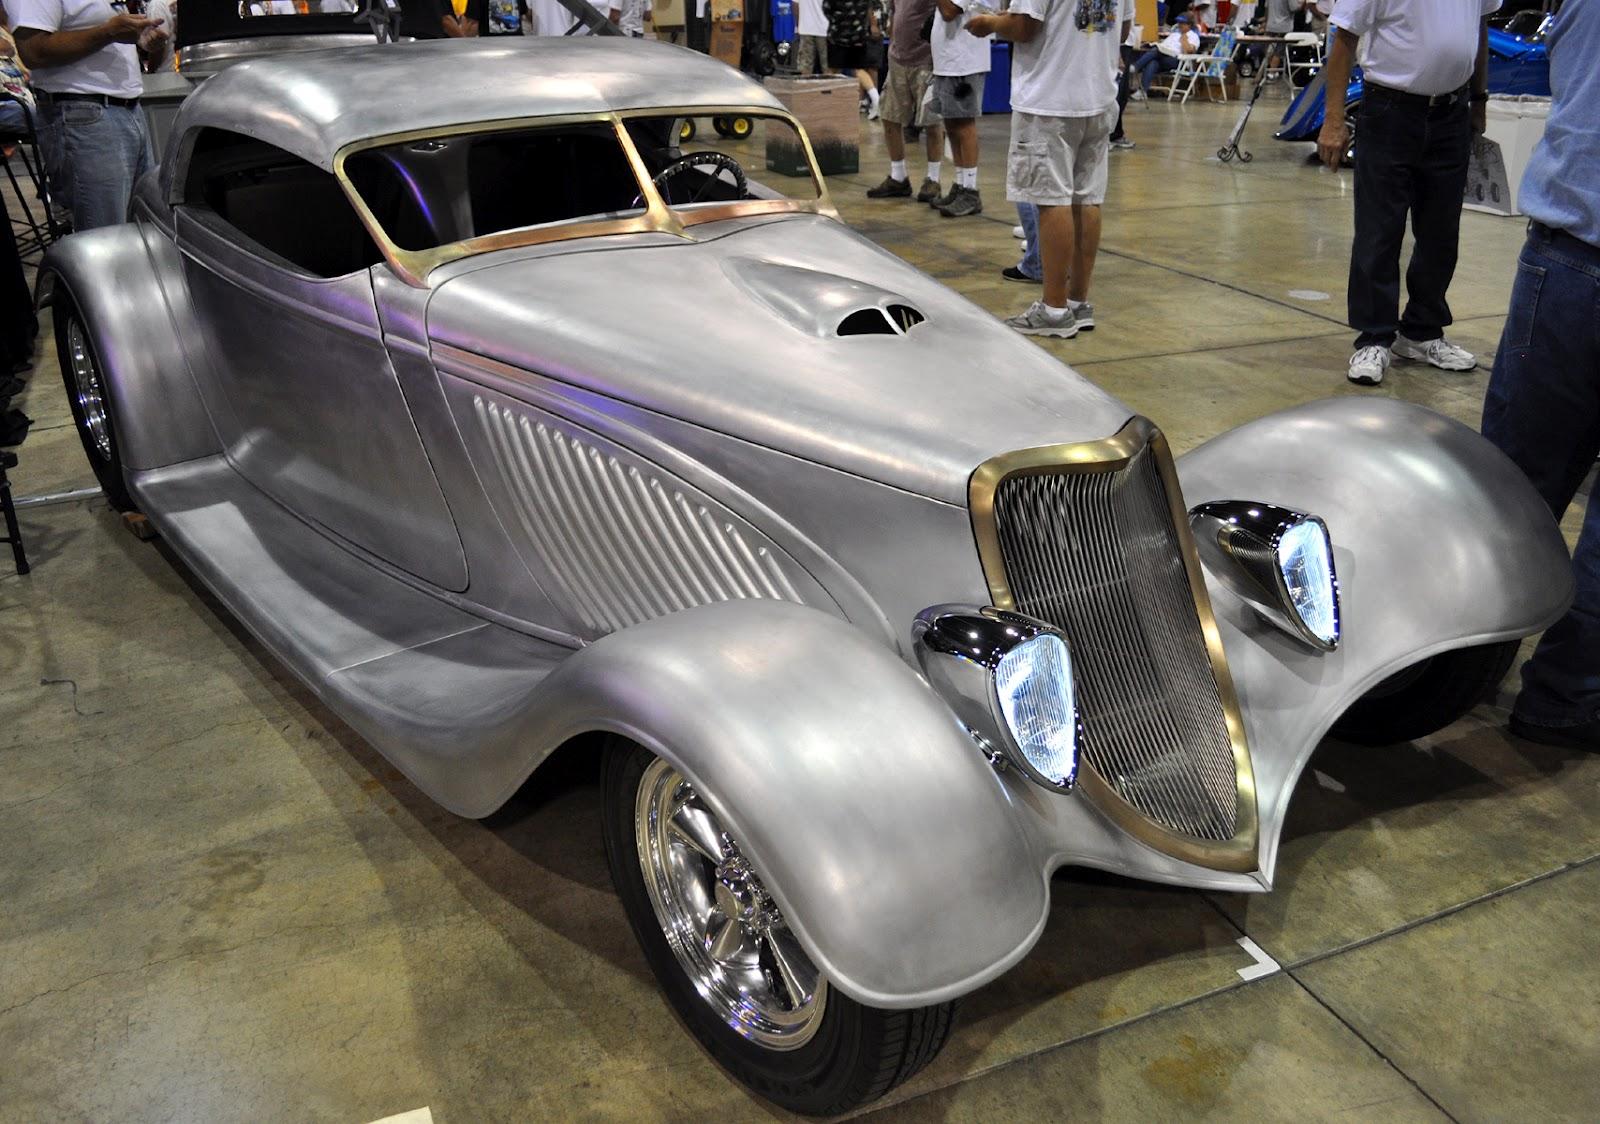 steve 39 s auto restoration has a striking aluminum hot rod. Black Bedroom Furniture Sets. Home Design Ideas